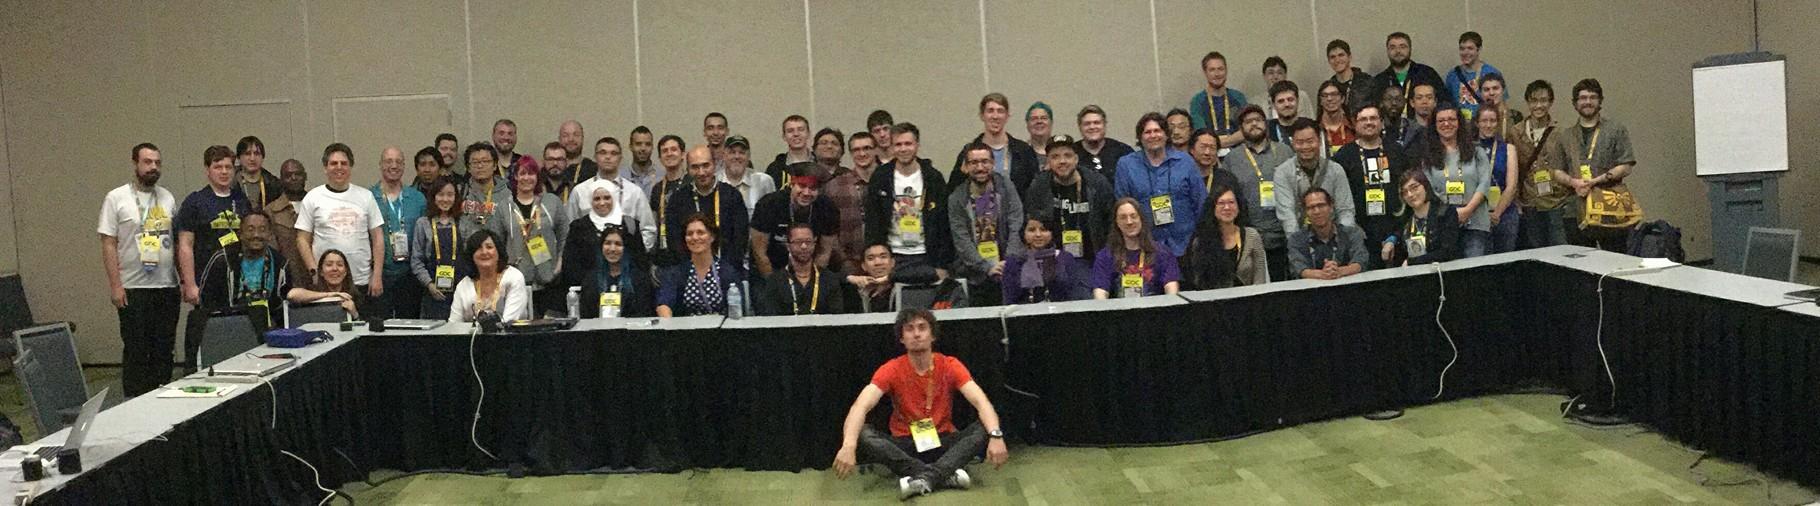 Global Game Jam at GDC 2015